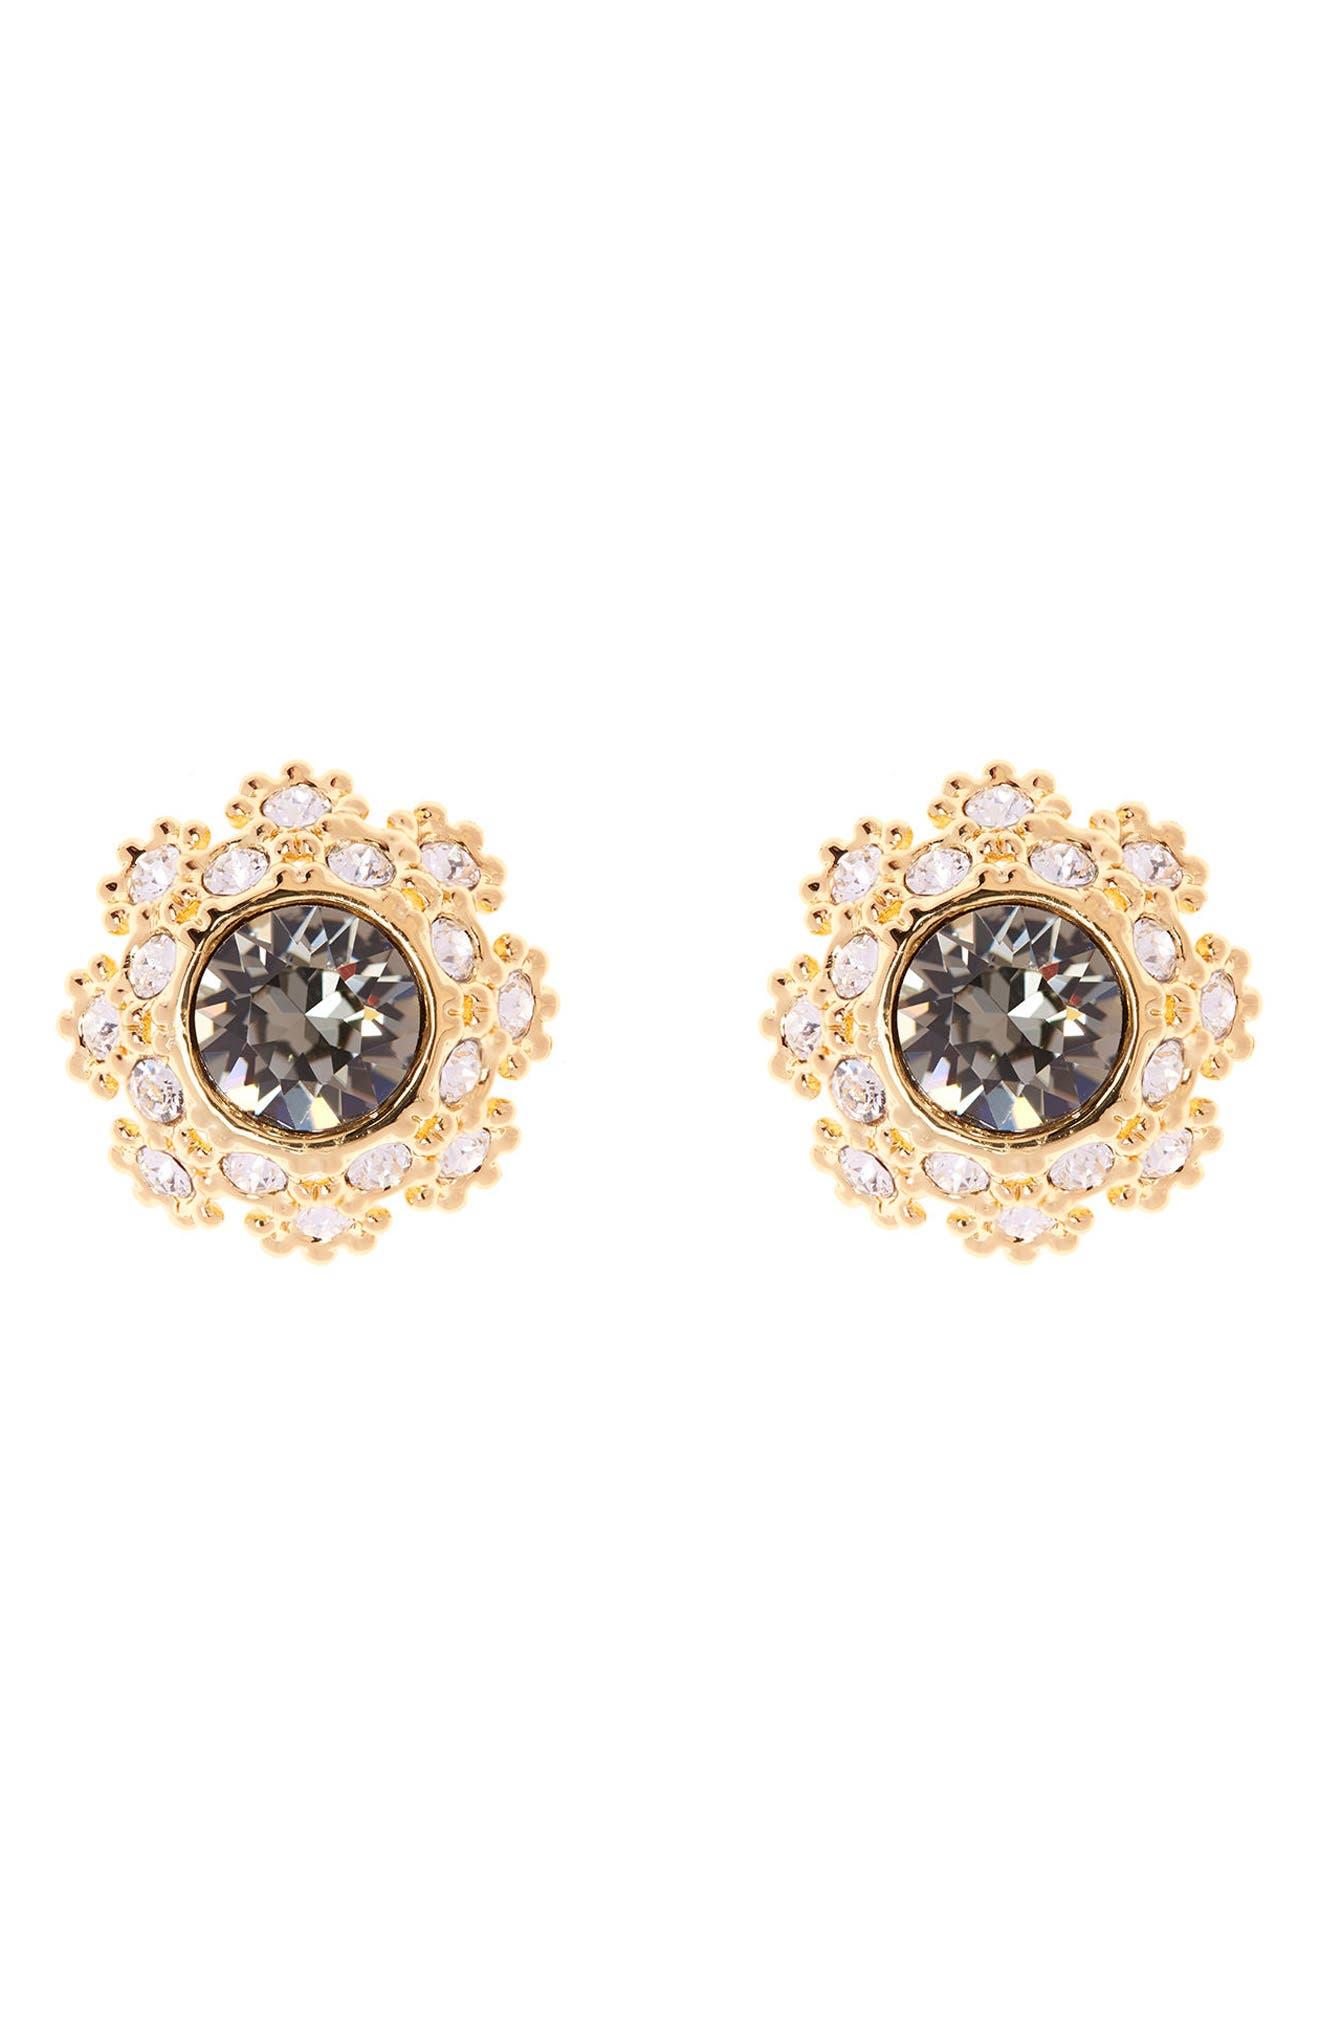 Crystal Daisy Lace Stud Earrings,                             Main thumbnail 1, color,                             009